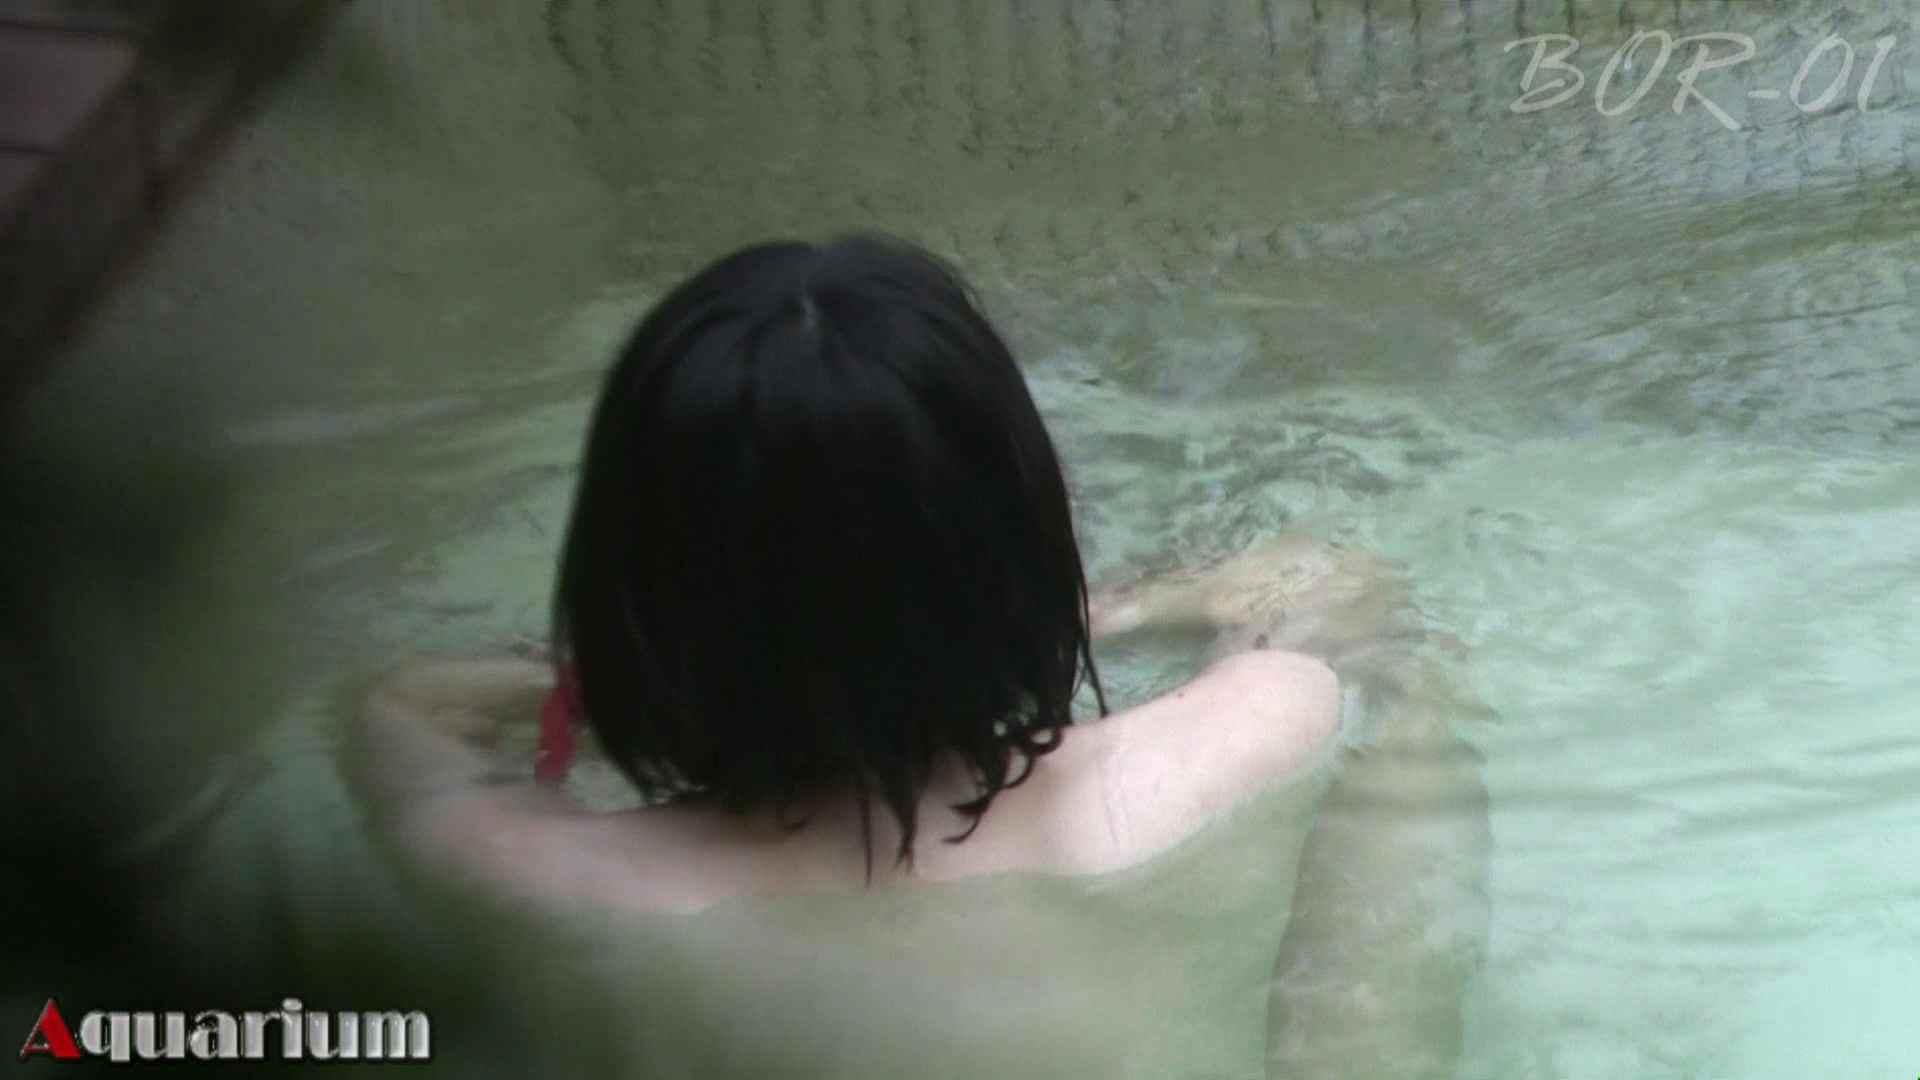 Aquaな露天風呂Vol.466 OLのエロ生活 オマンコ動画キャプチャ 72連発 47